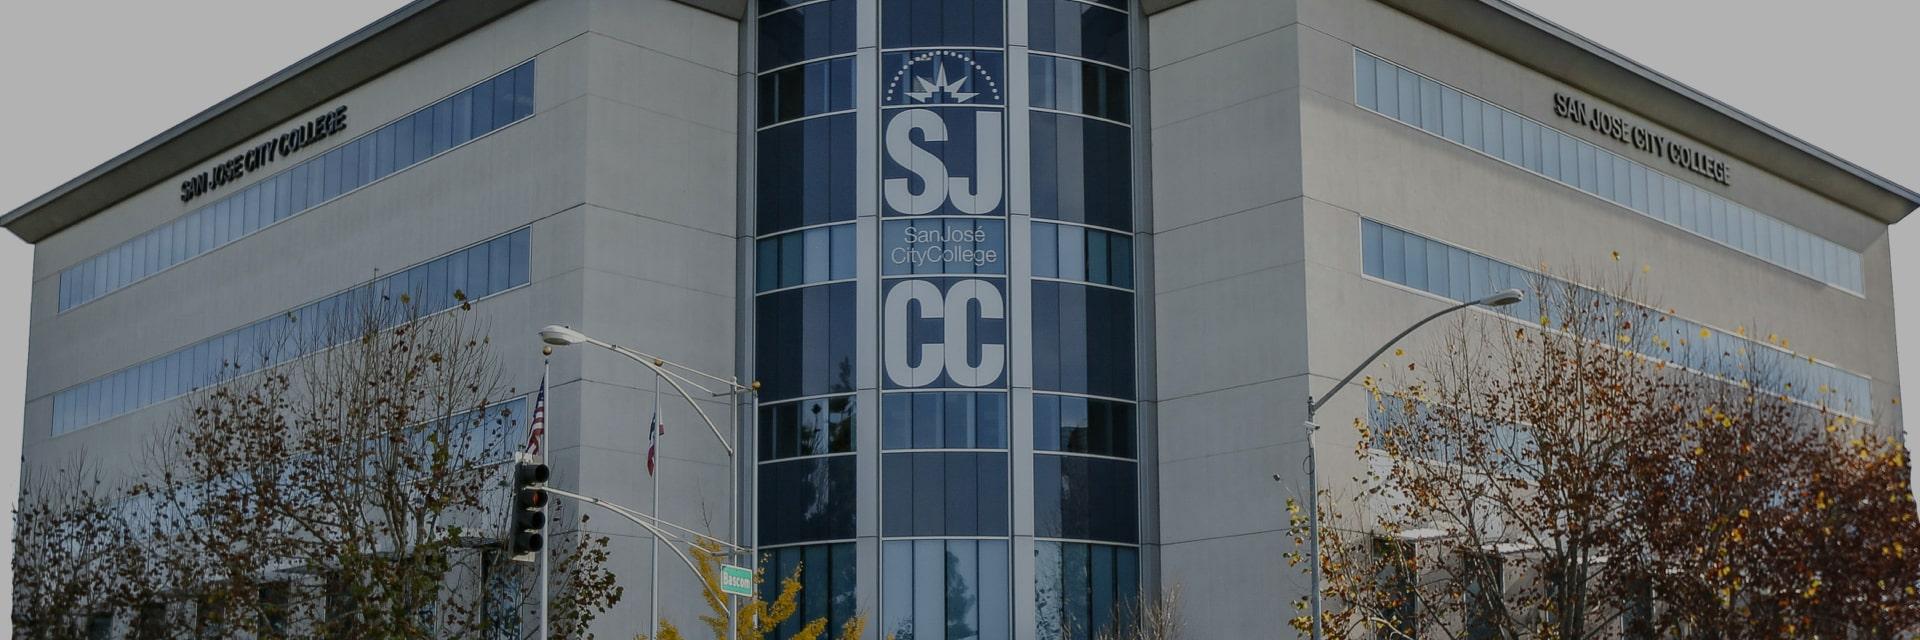 San Jose City College